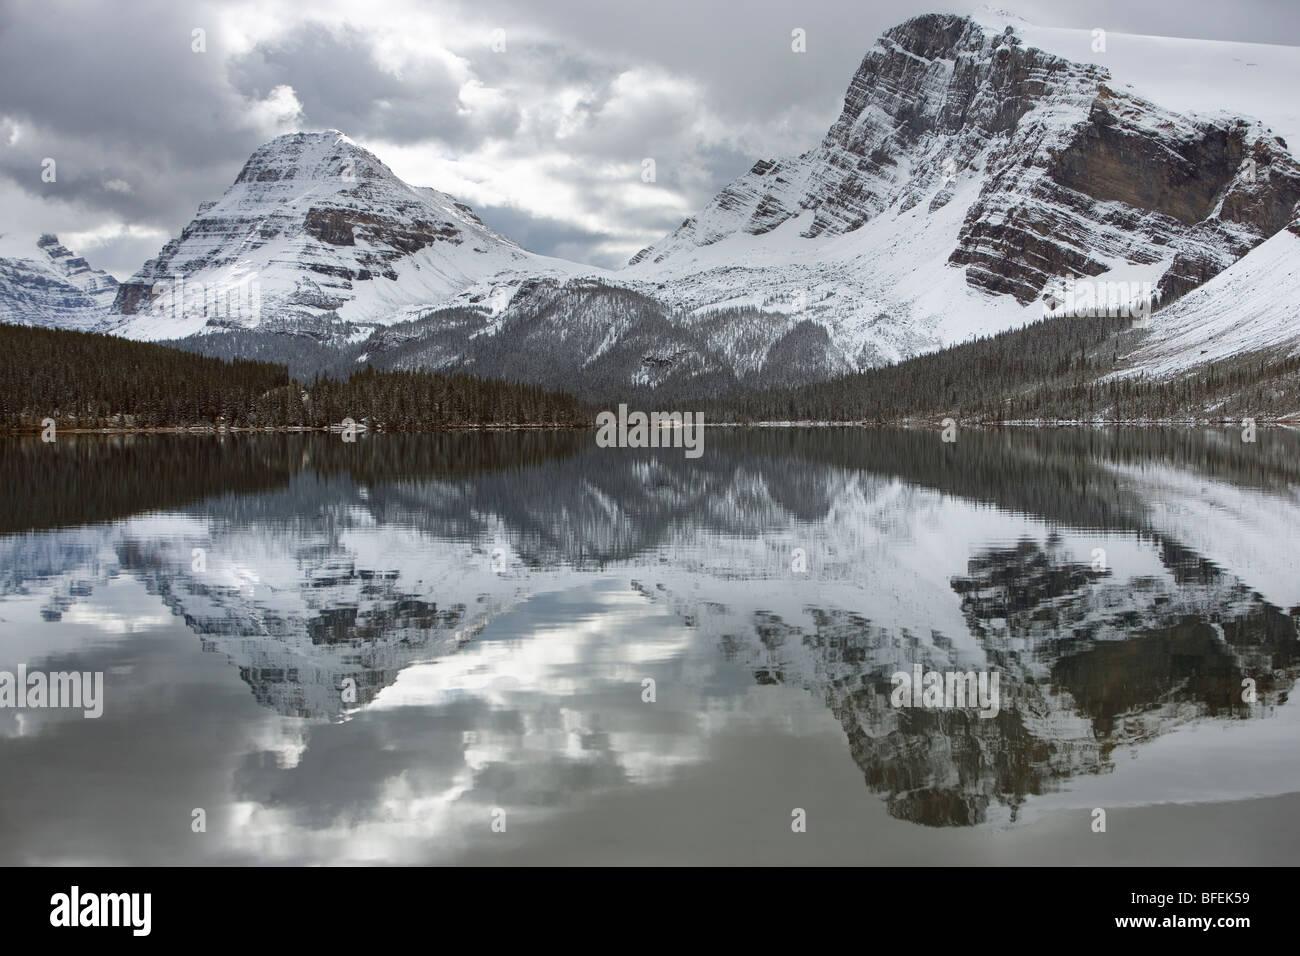 El Lago Bow, Arco Pico Cumbre en proa, Parque Nacional de Banff, Alberta, Canadá Imagen De Stock